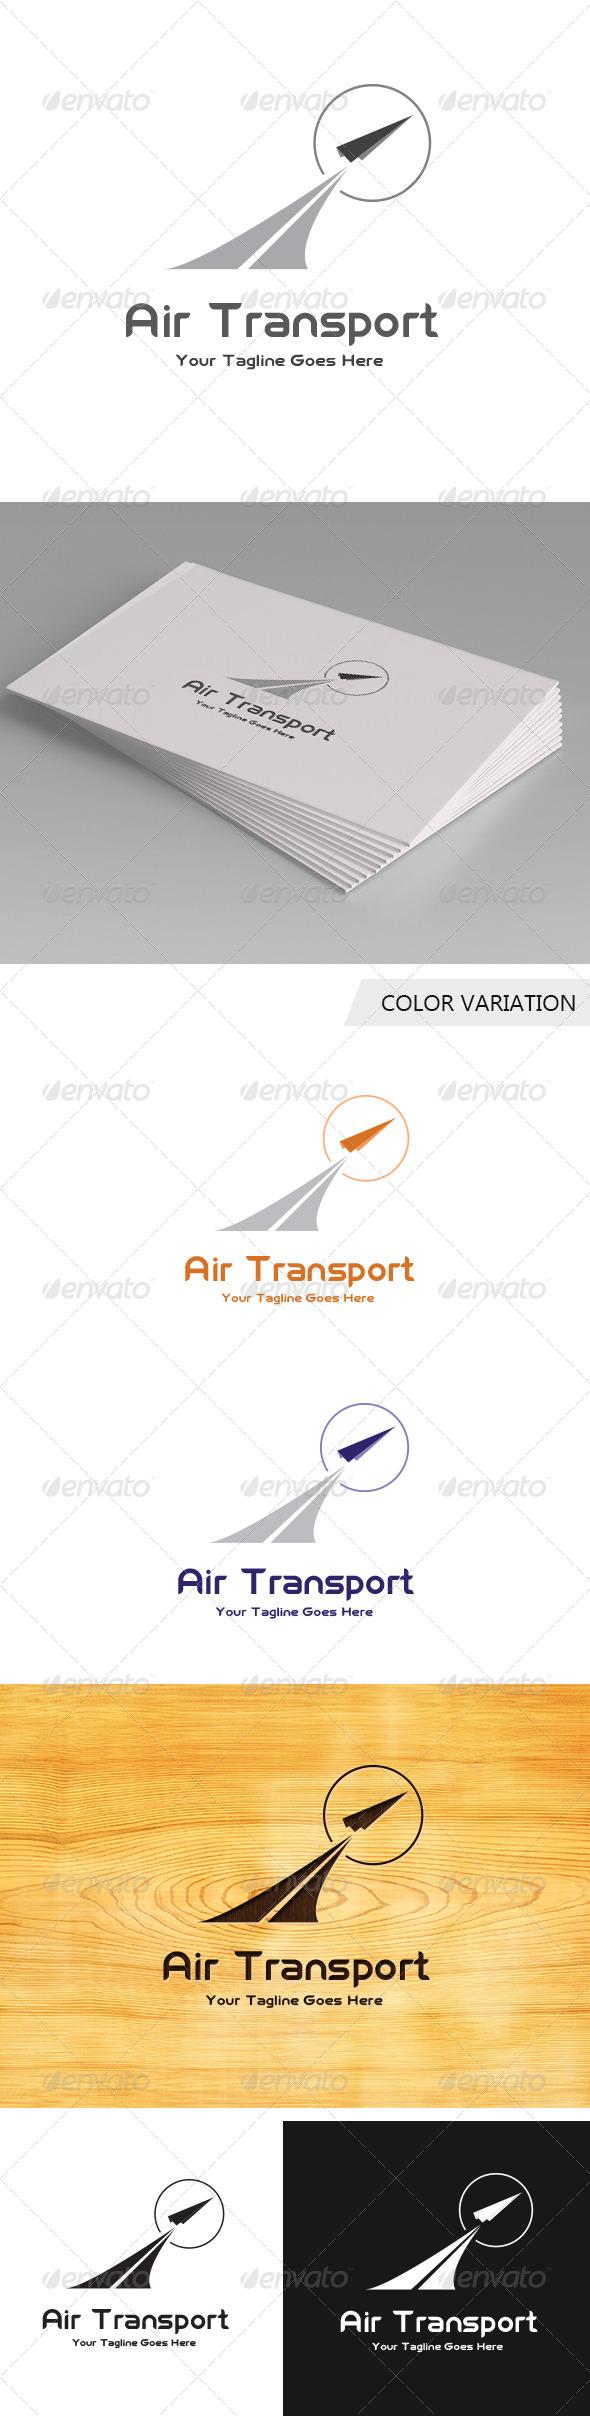 GraphicRiver Air transport logo Template 5641253